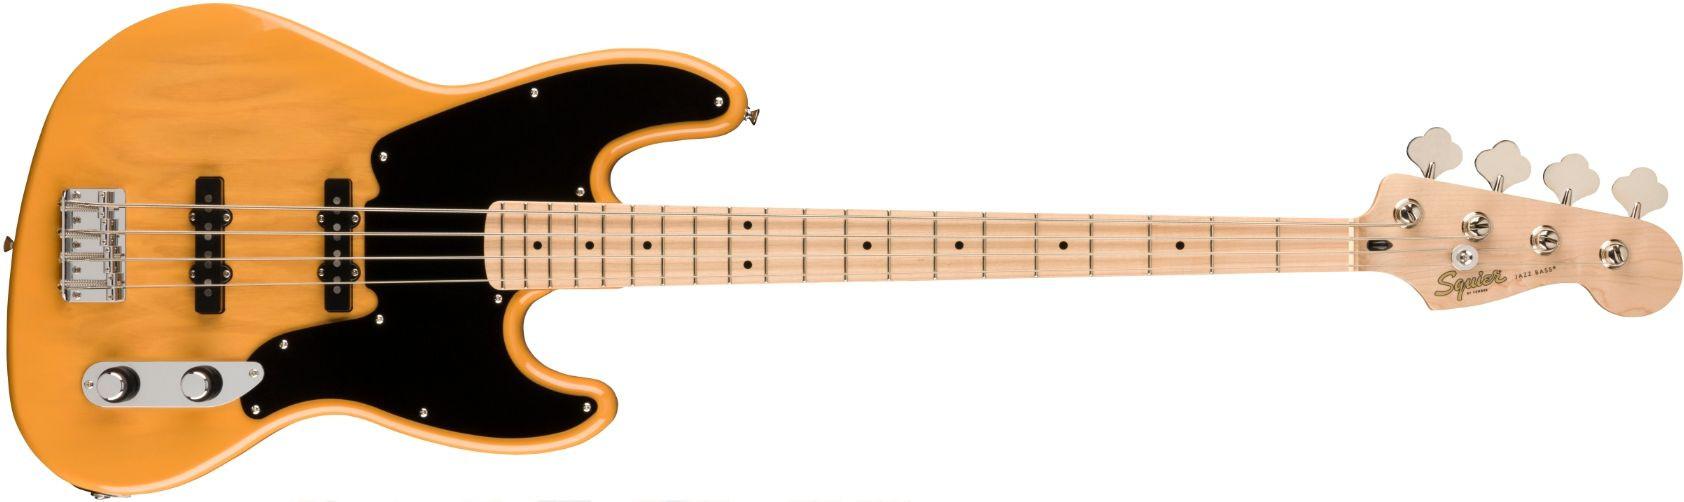 FENDER SQUIER Paranormal Jazz Bass 54 Butterscotch Blonde Maple